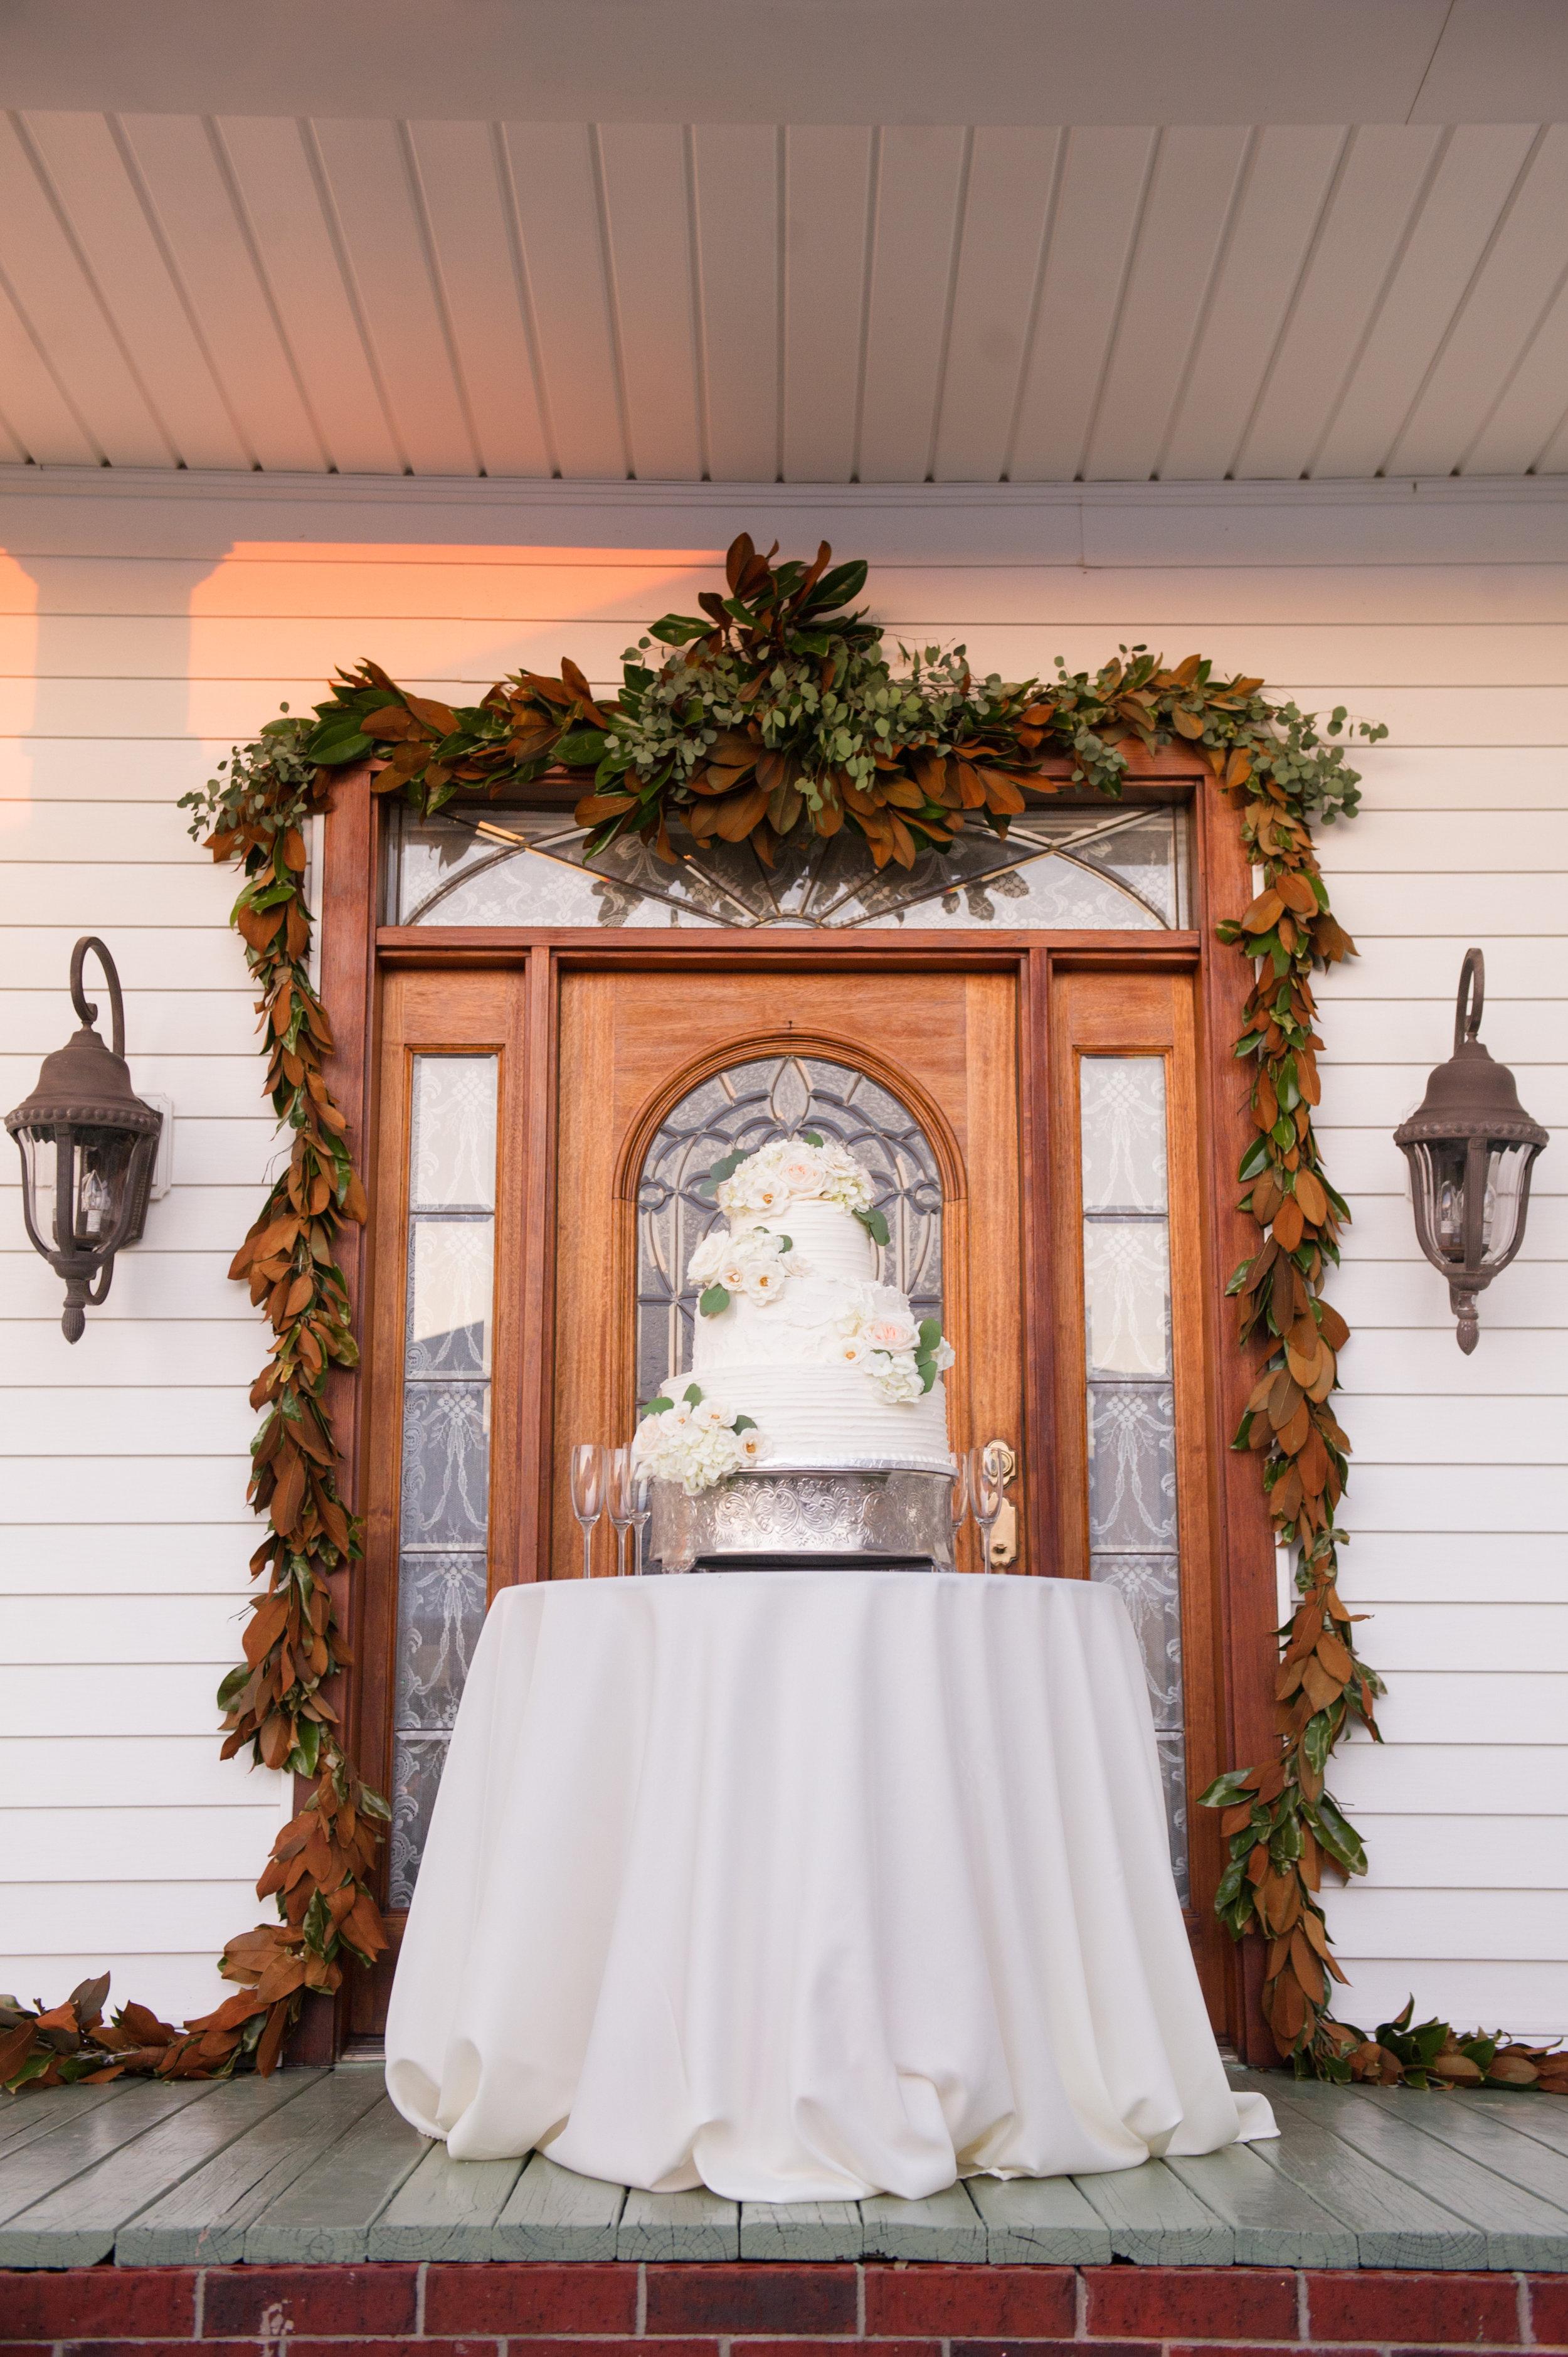 Southern Fete, Southern Wedding, Sugar Belle by Elise, Bride's Cake